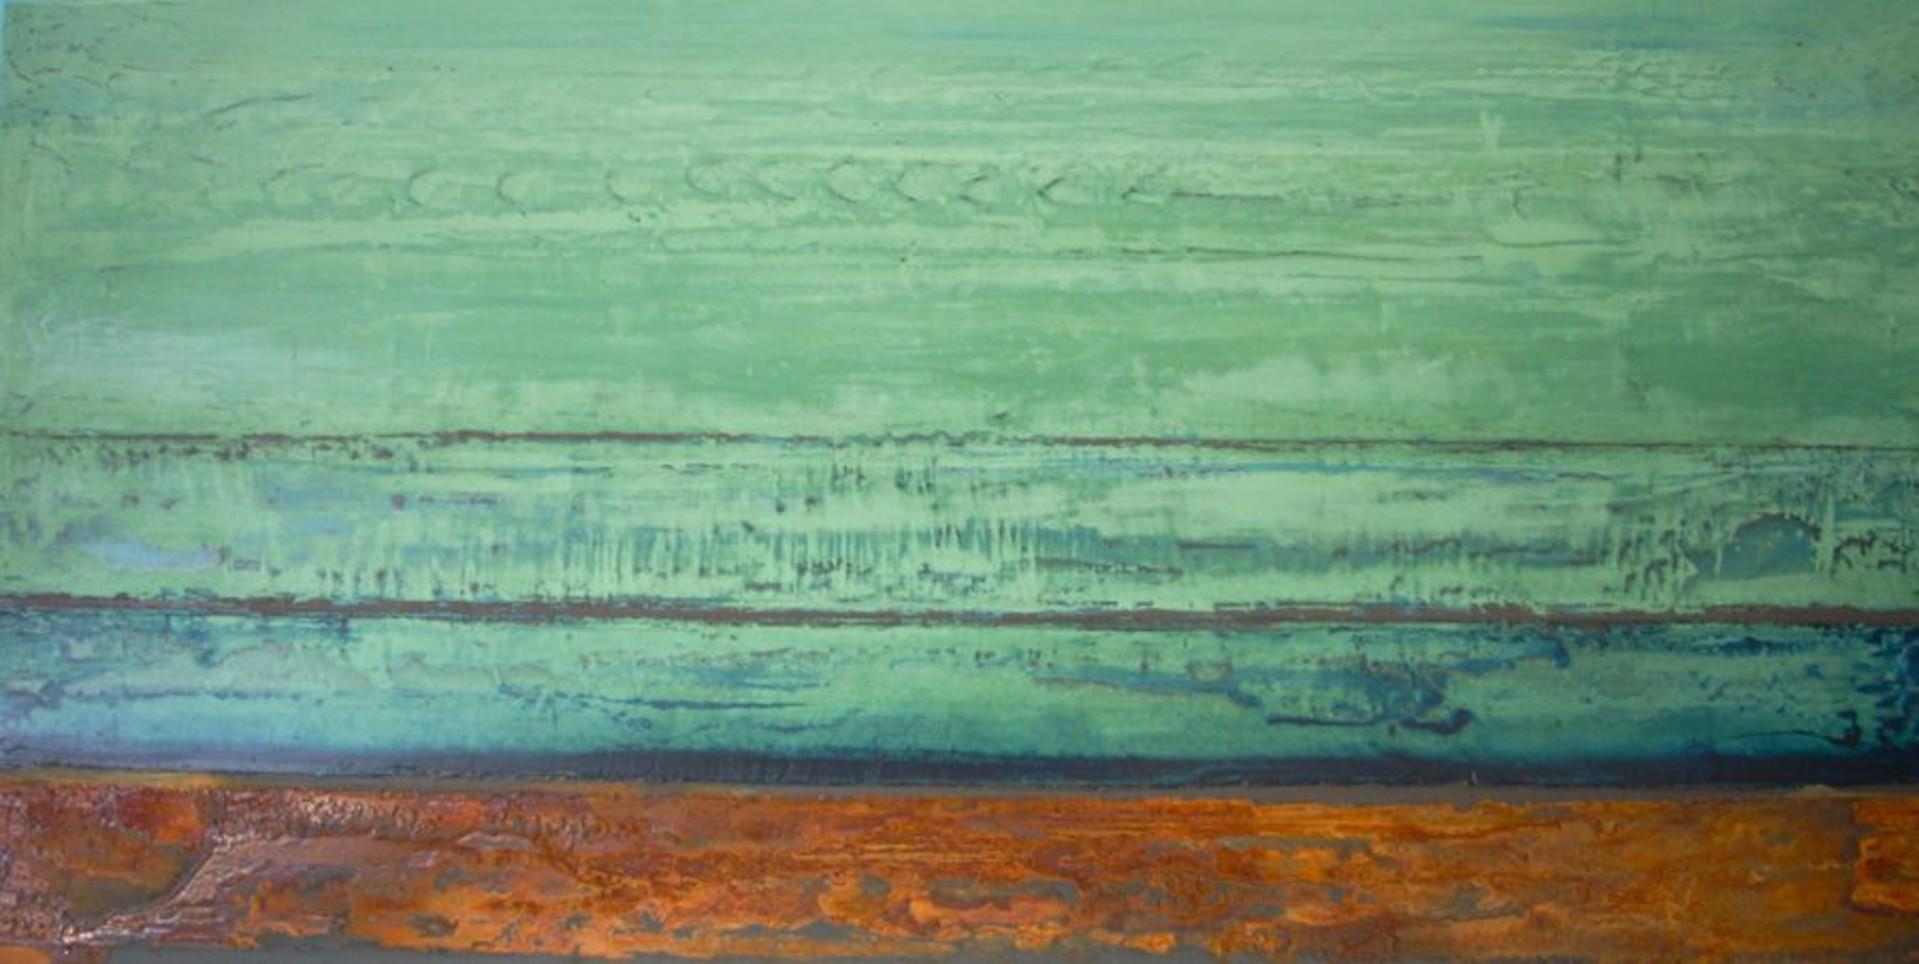 Sacred Passage by Stephanie Paige